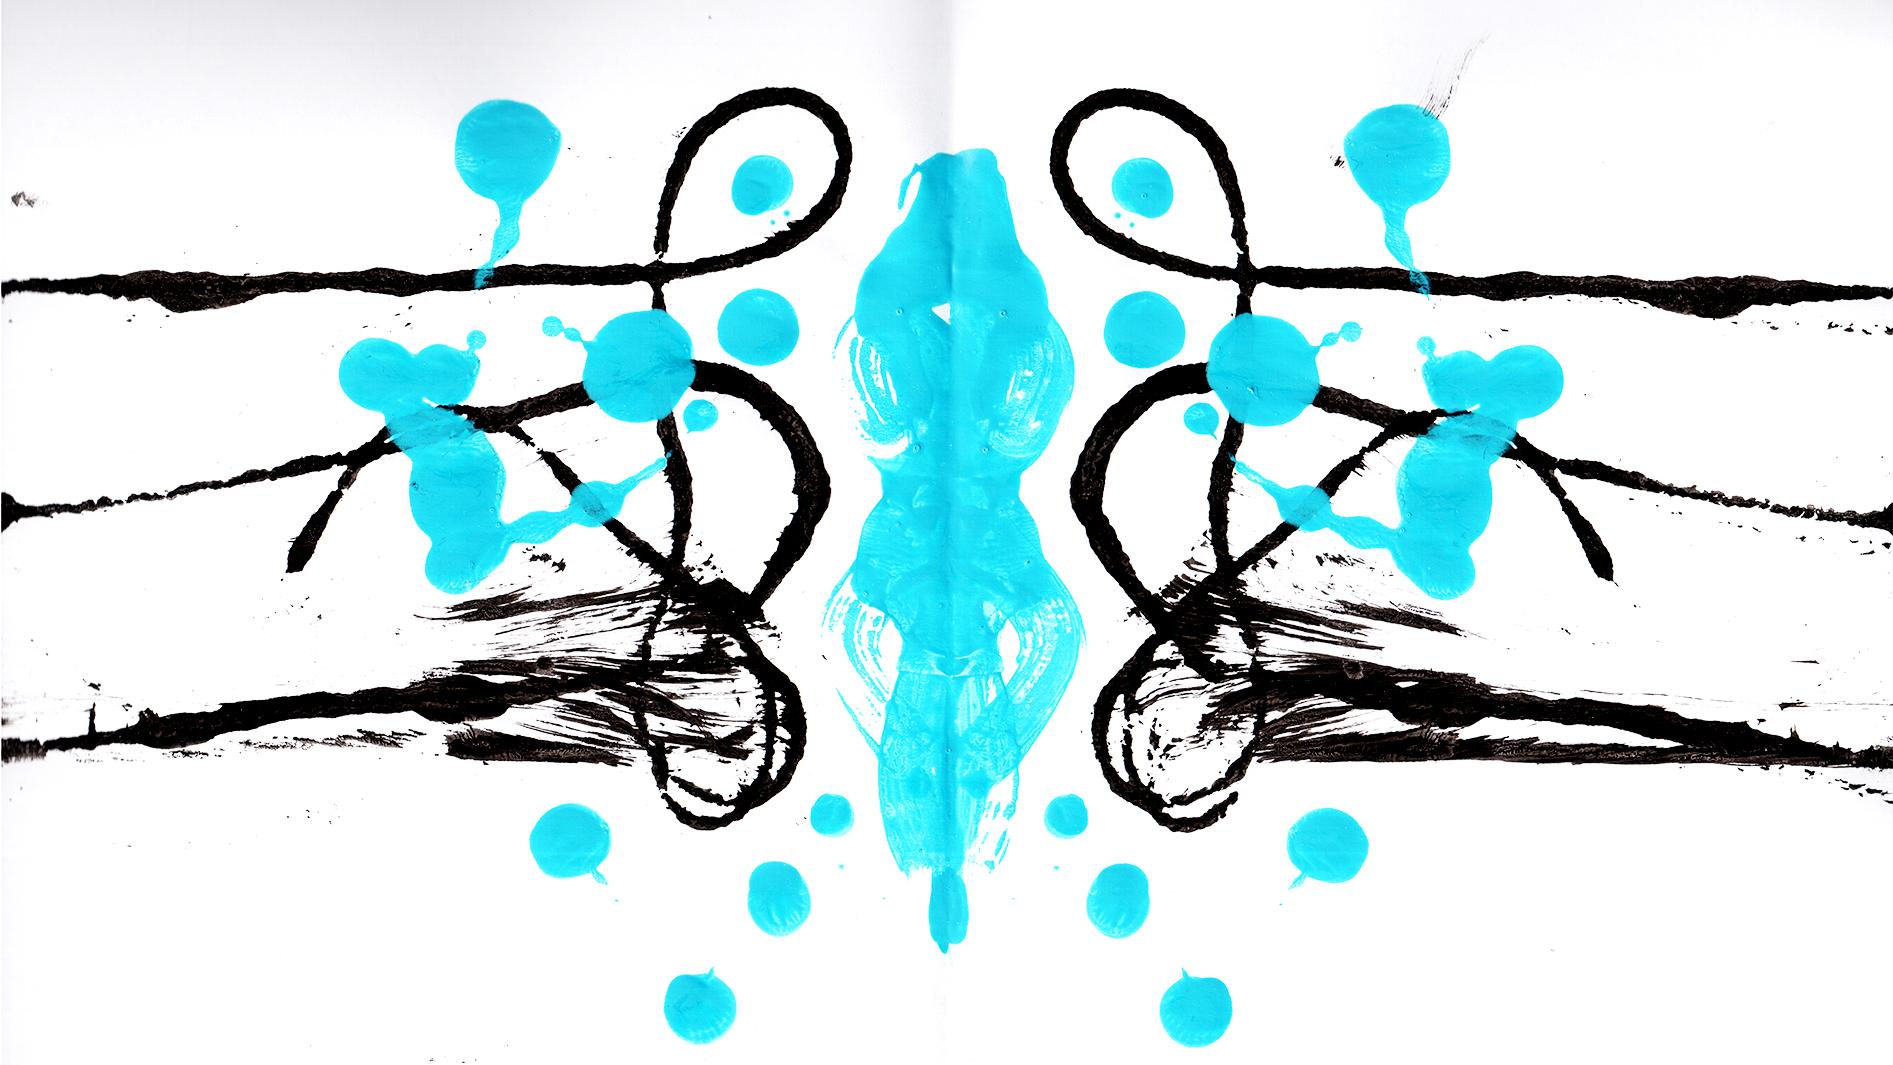 symmetri pa analogt vis - skrivbordsbild